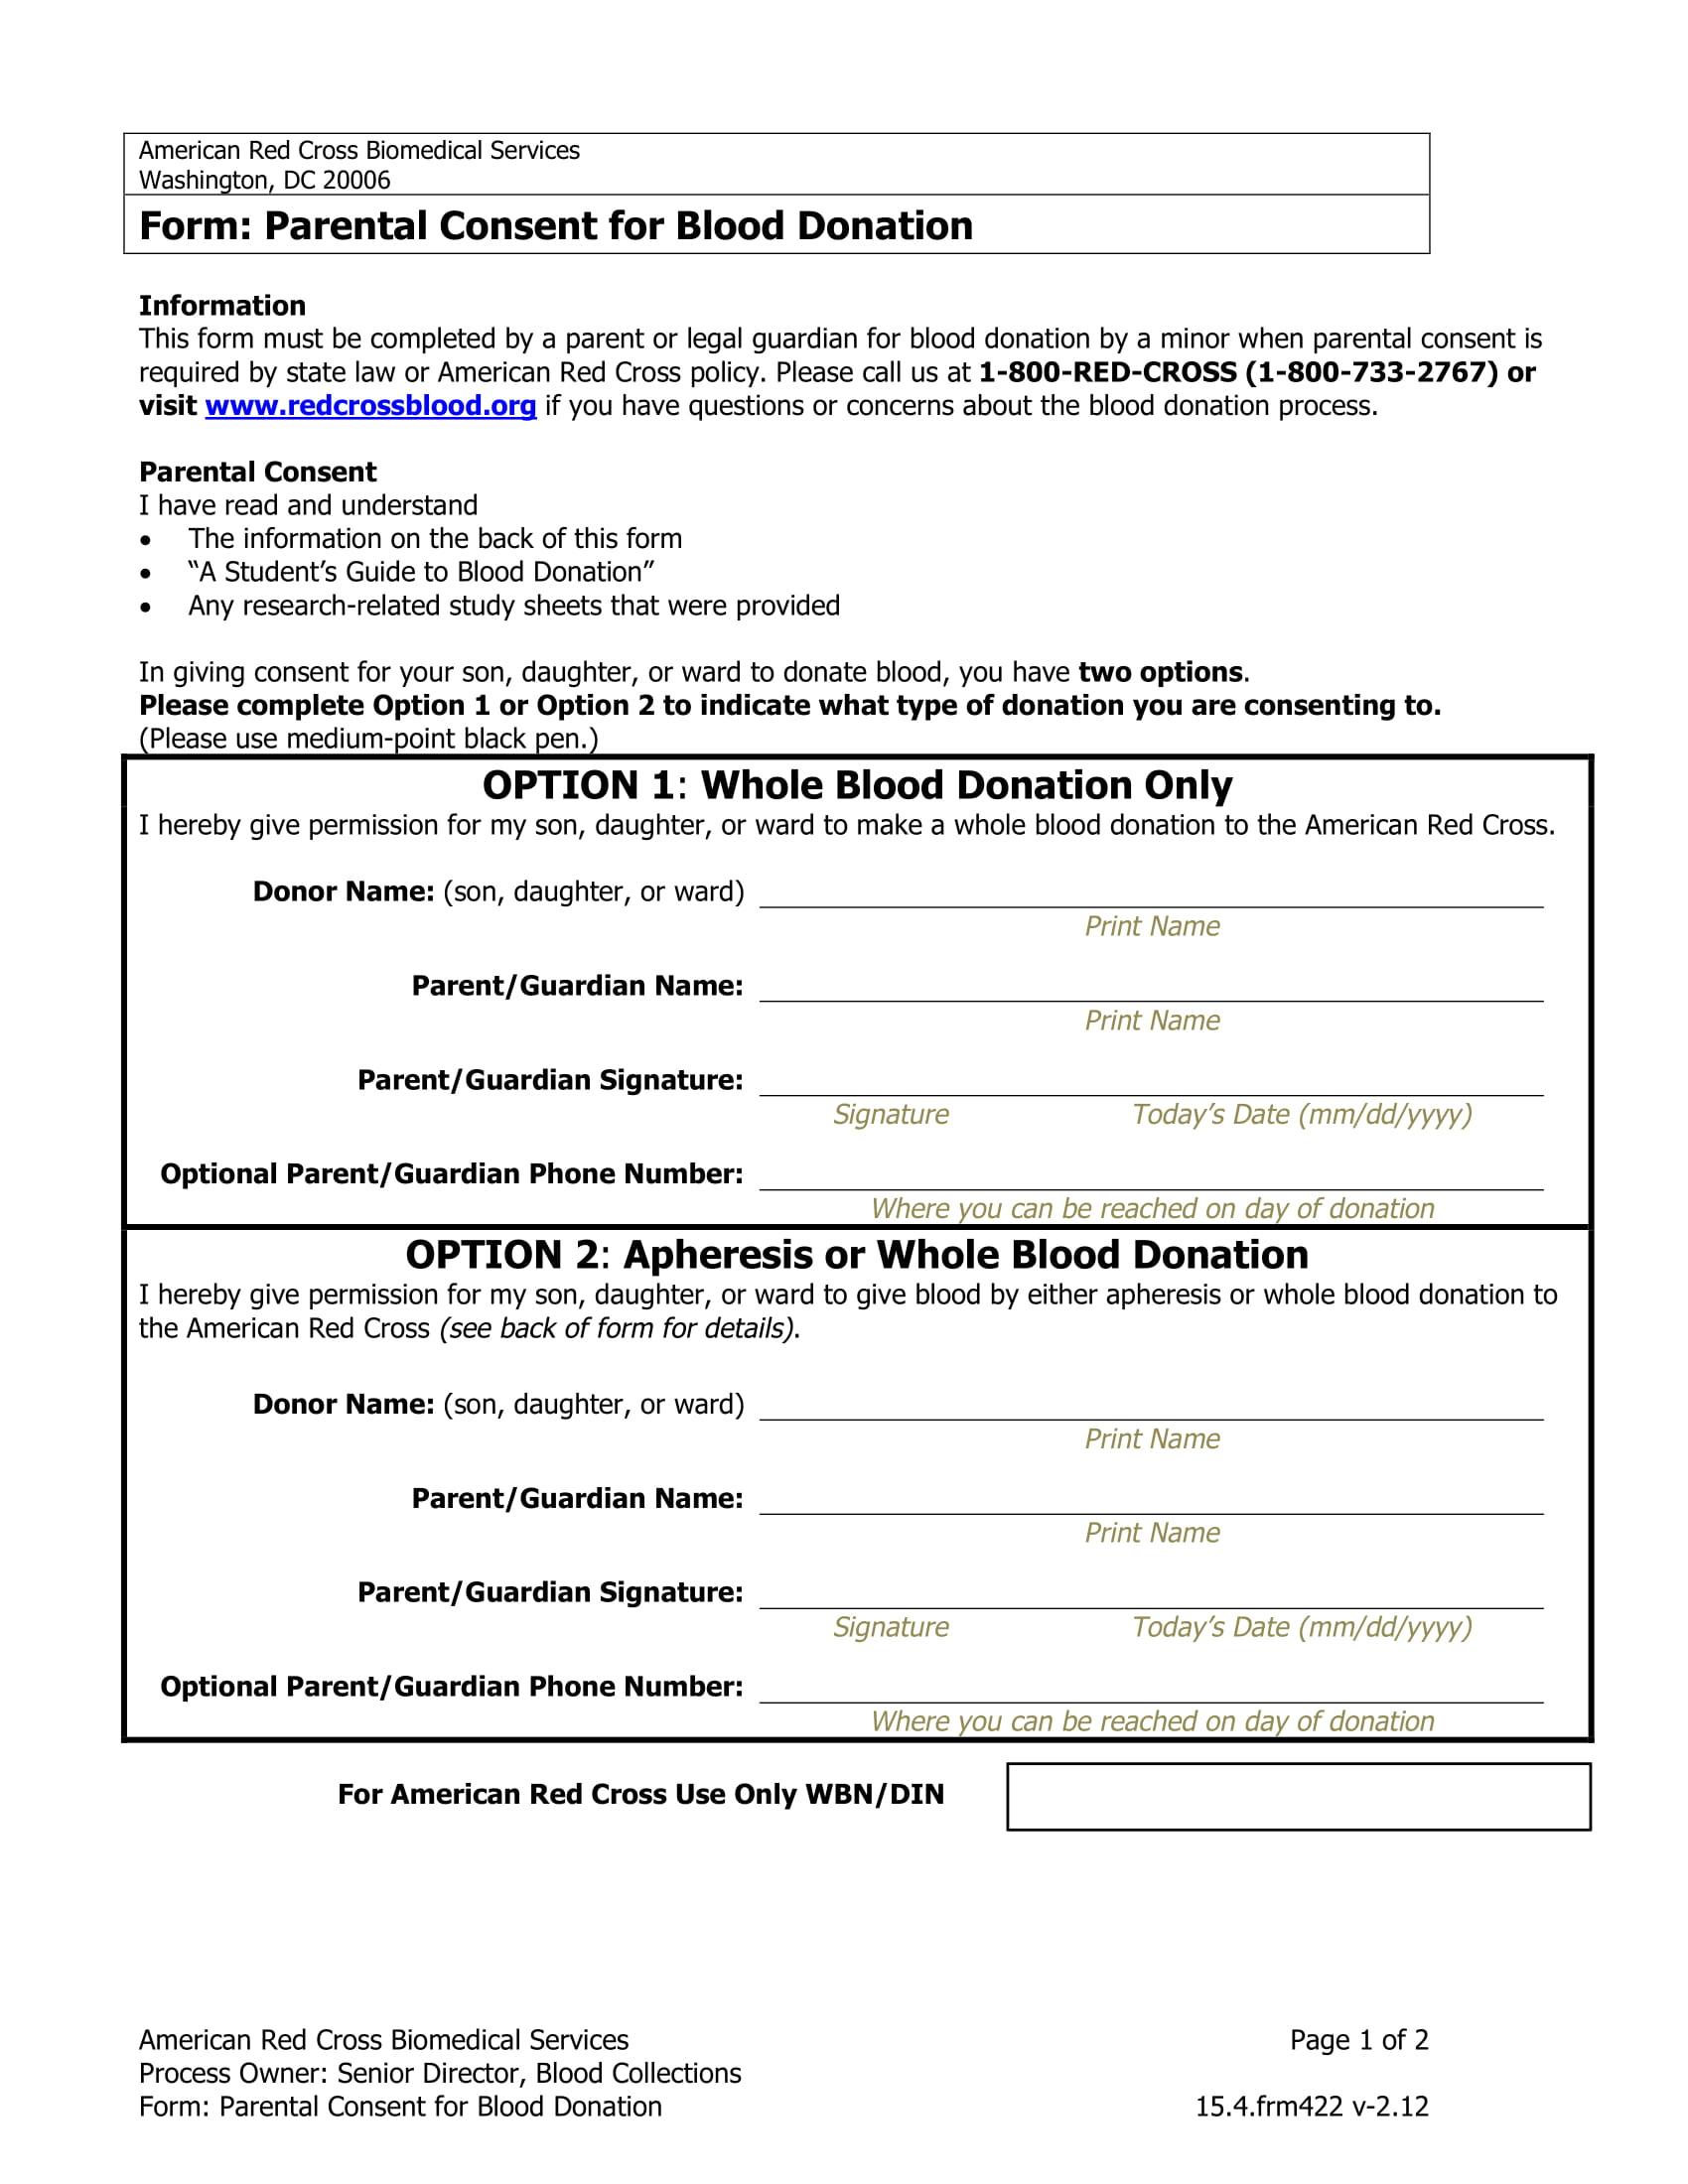 blood donation parental consent form 1